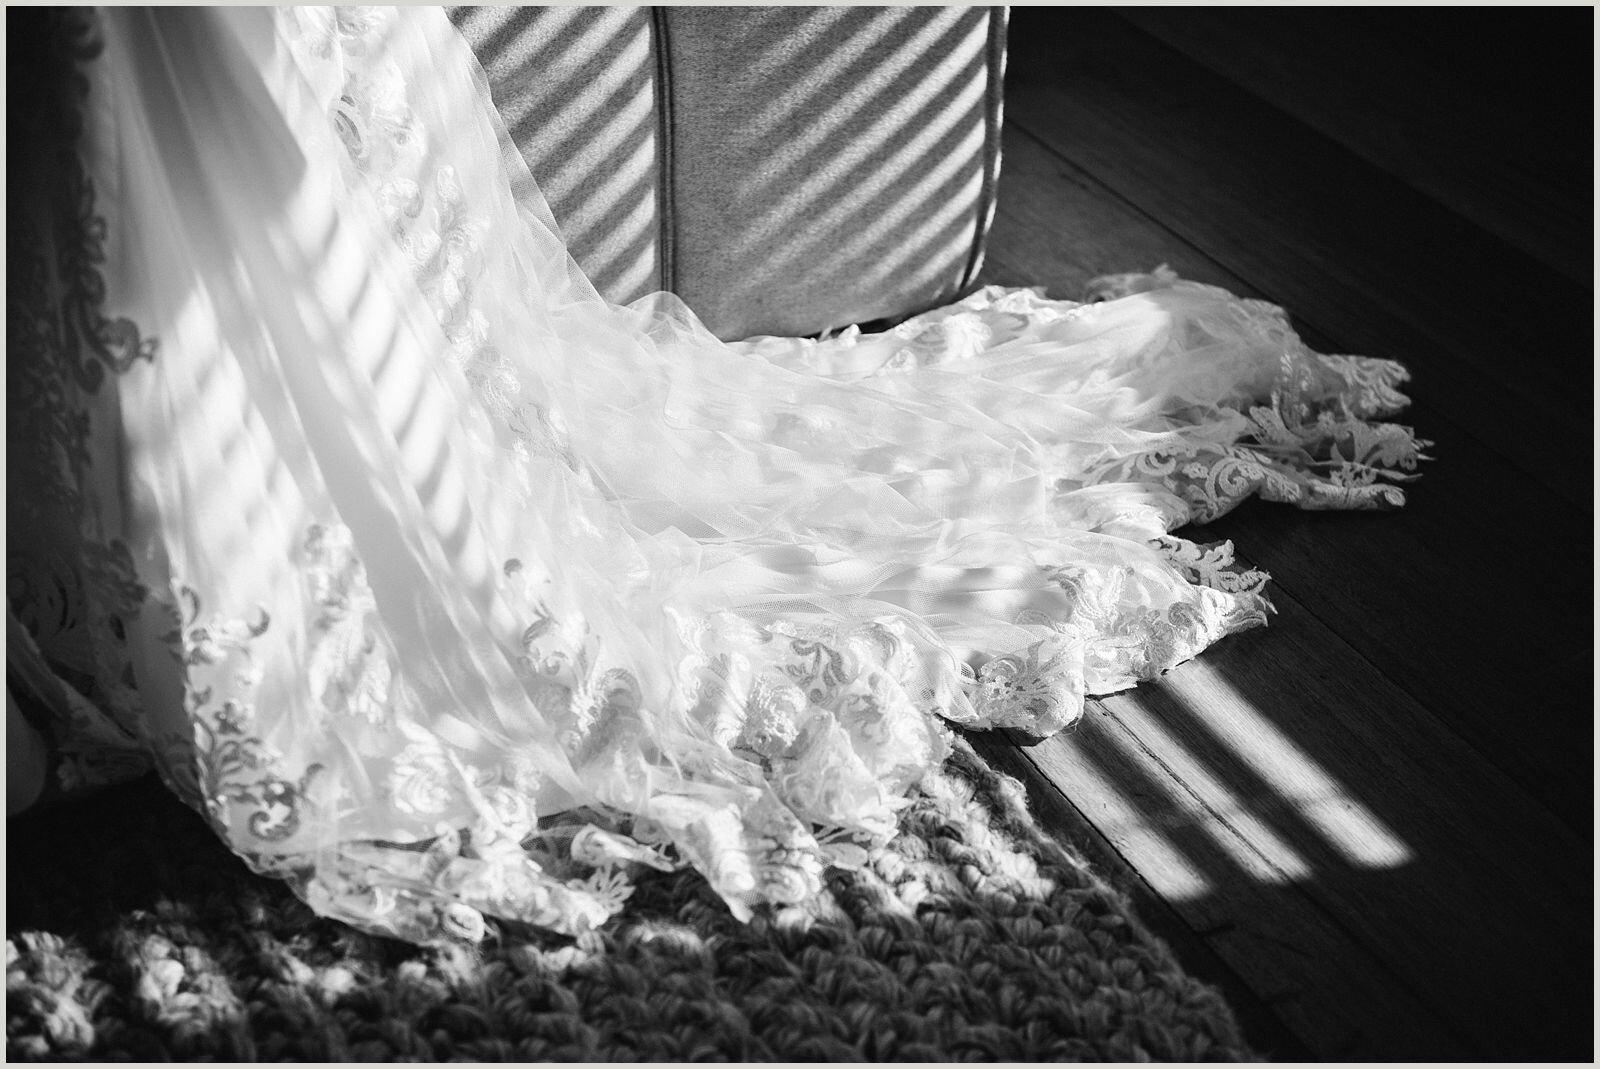 joseph_koprek_wedding_melbourne_the_prince_deck_0017.jpg